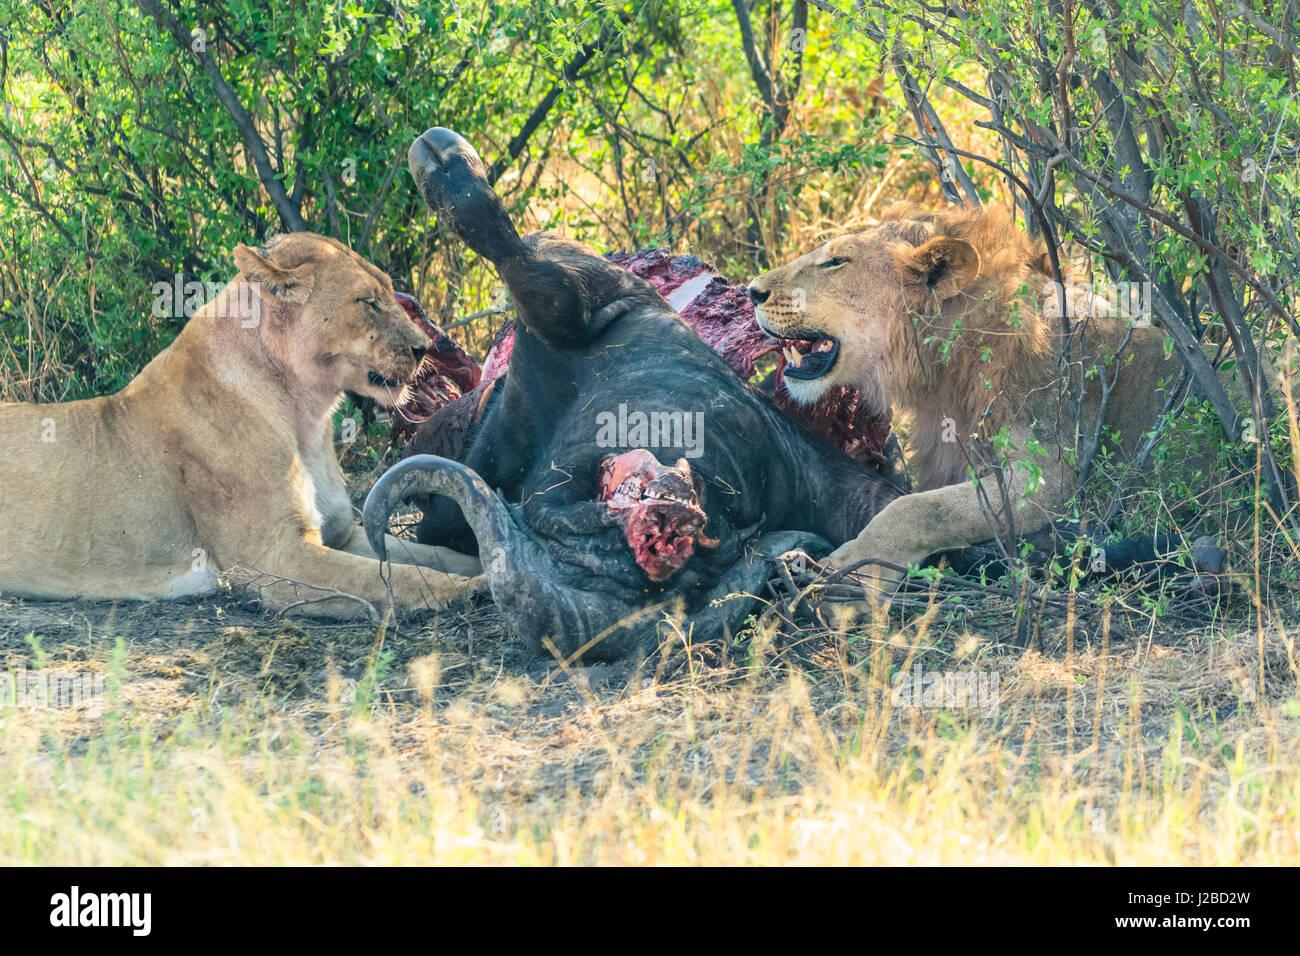 Botswana. Chobe National Park. Savuti. Pride of lions eating a Cape buffalo. - Stock Image